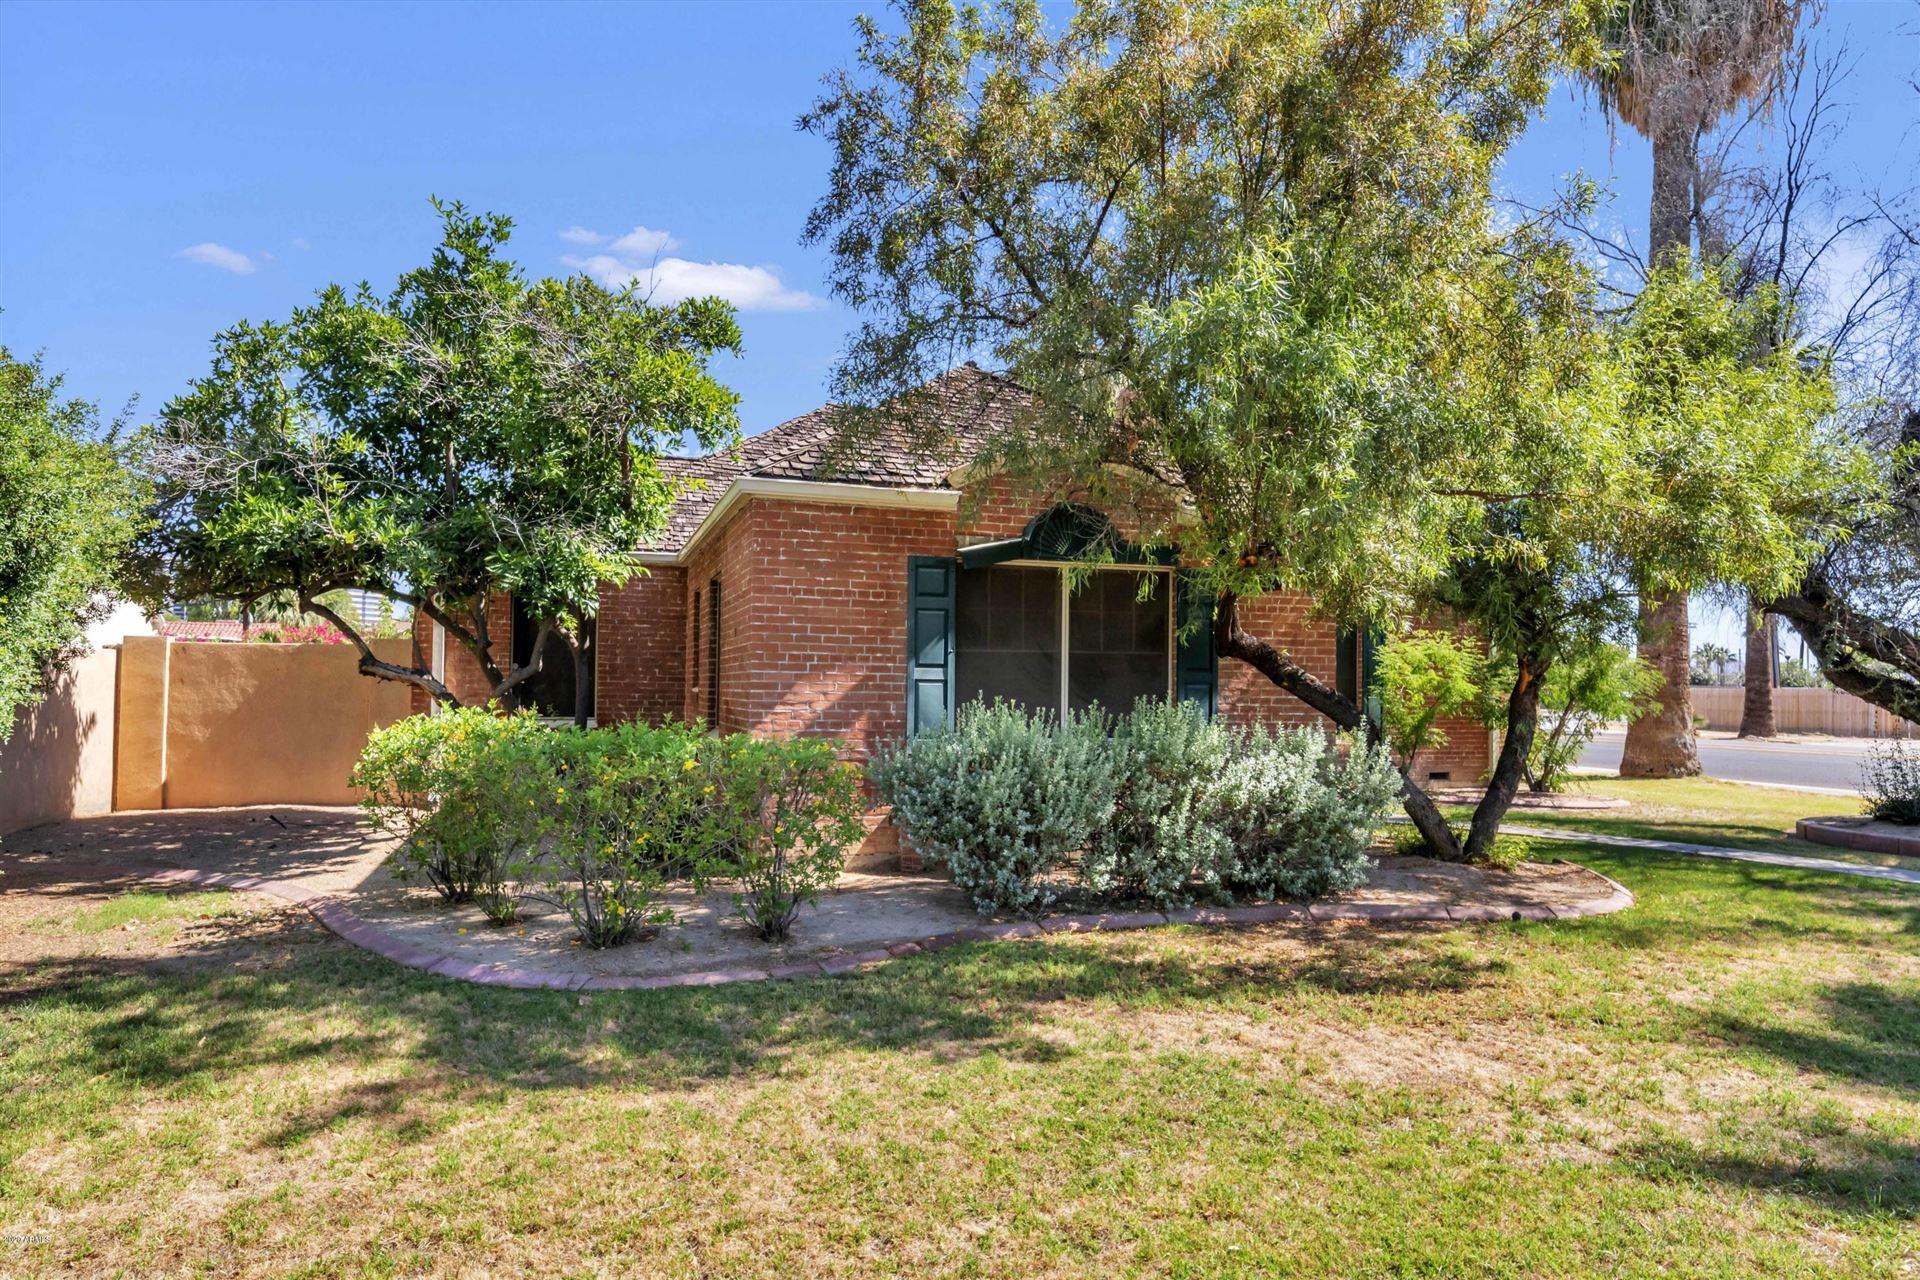 130 E ALVARADO Road, Phoenix, AZ 85004 - MLS#: 6084298